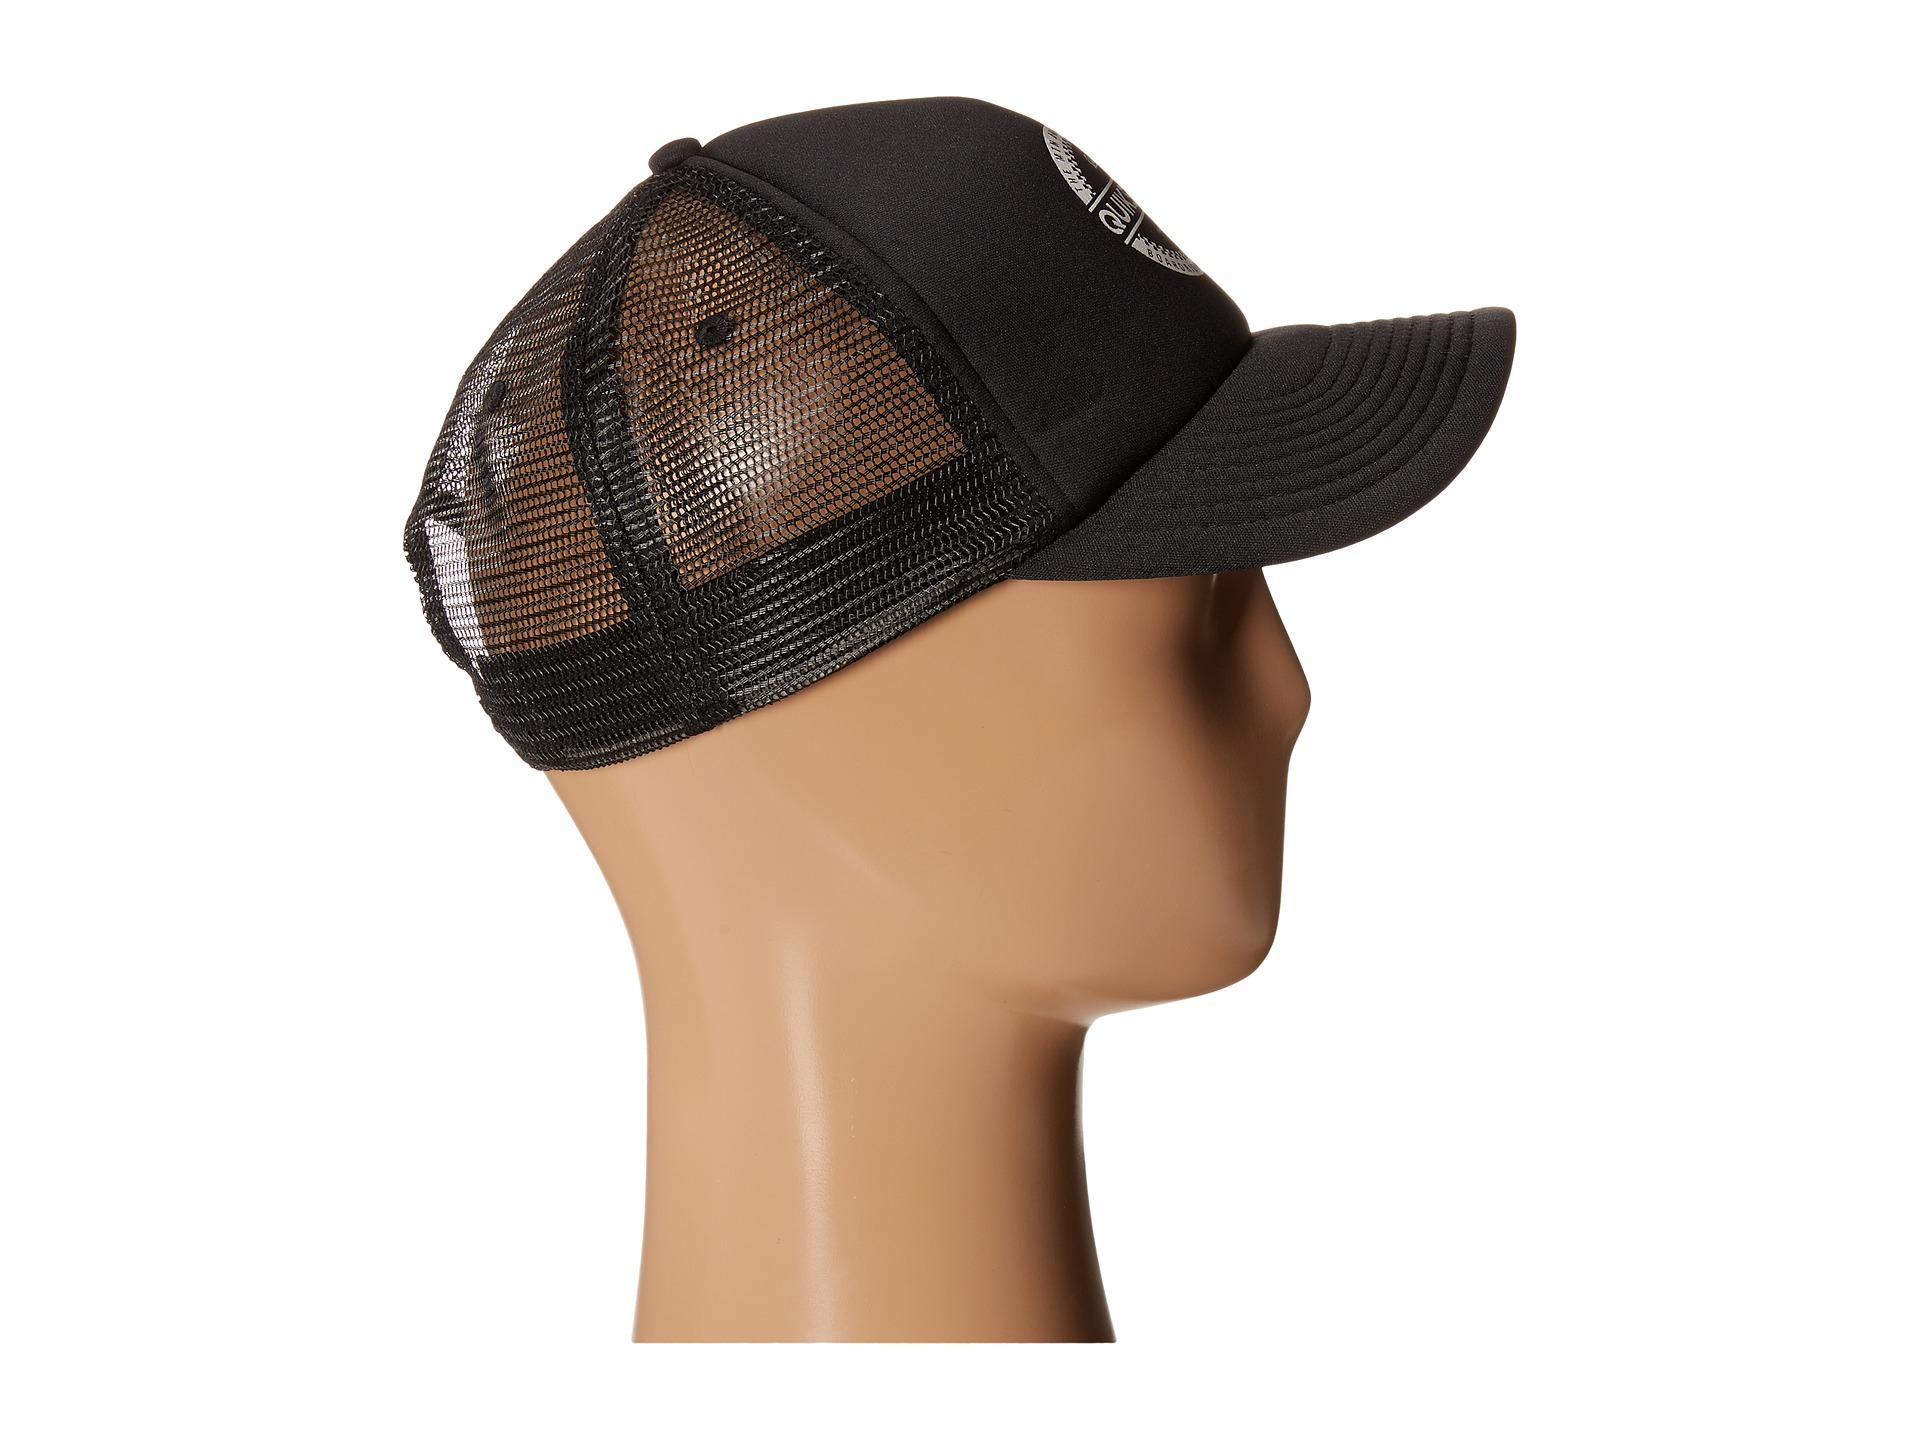 Lyst - Quiksilver Everyday 3 Trucker Hat in Black for Men 61a4f0665faf